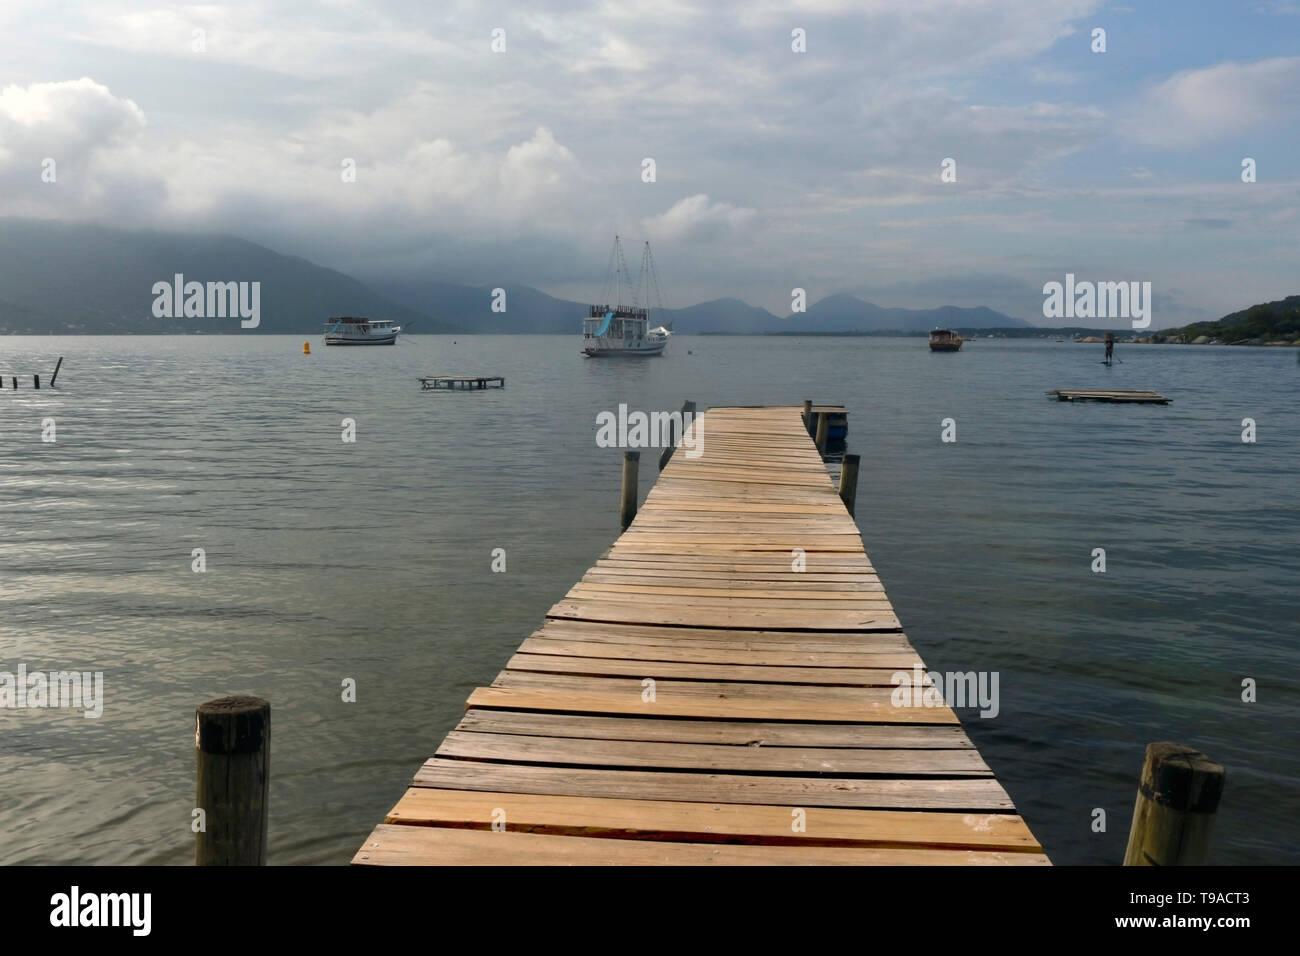 Wooden Pier in Conceição Lagoon - Florianopolis - SC - Brazil - Stock Image